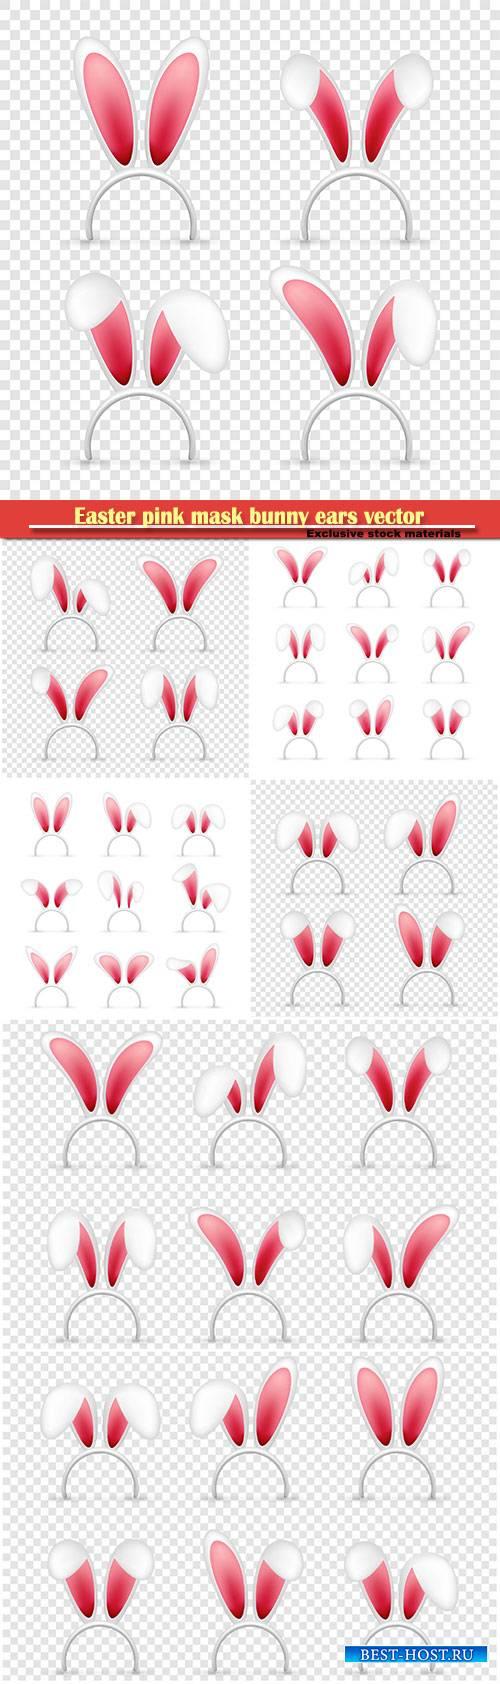 Easter pink mask bunny ears vector illustration